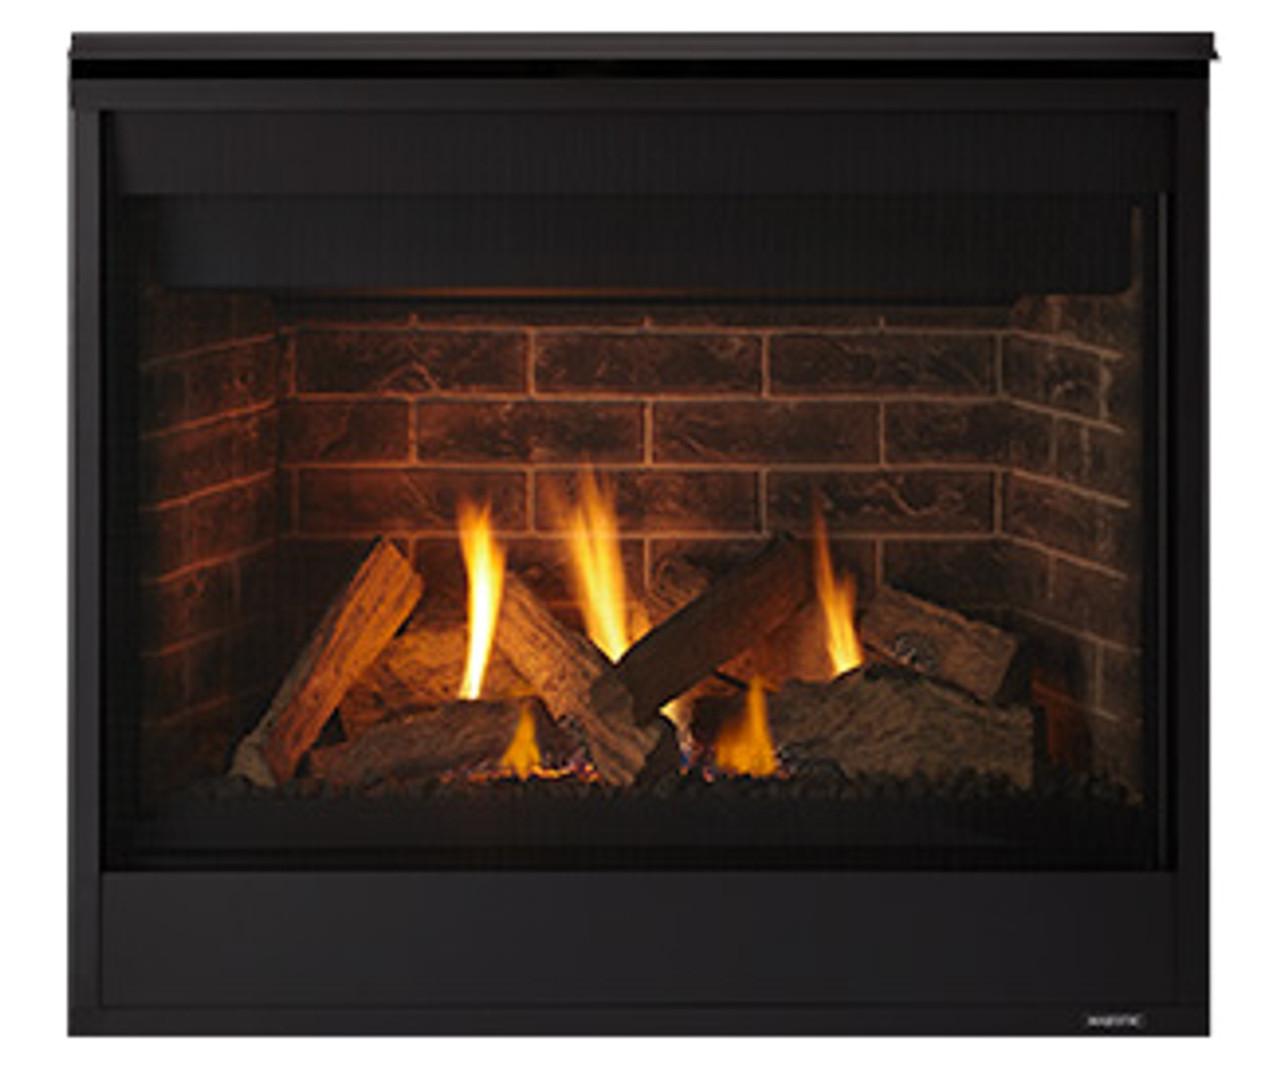 majestic gas fireplace wiring diagram fireplaces [ 1280 x 1088 Pixel ]